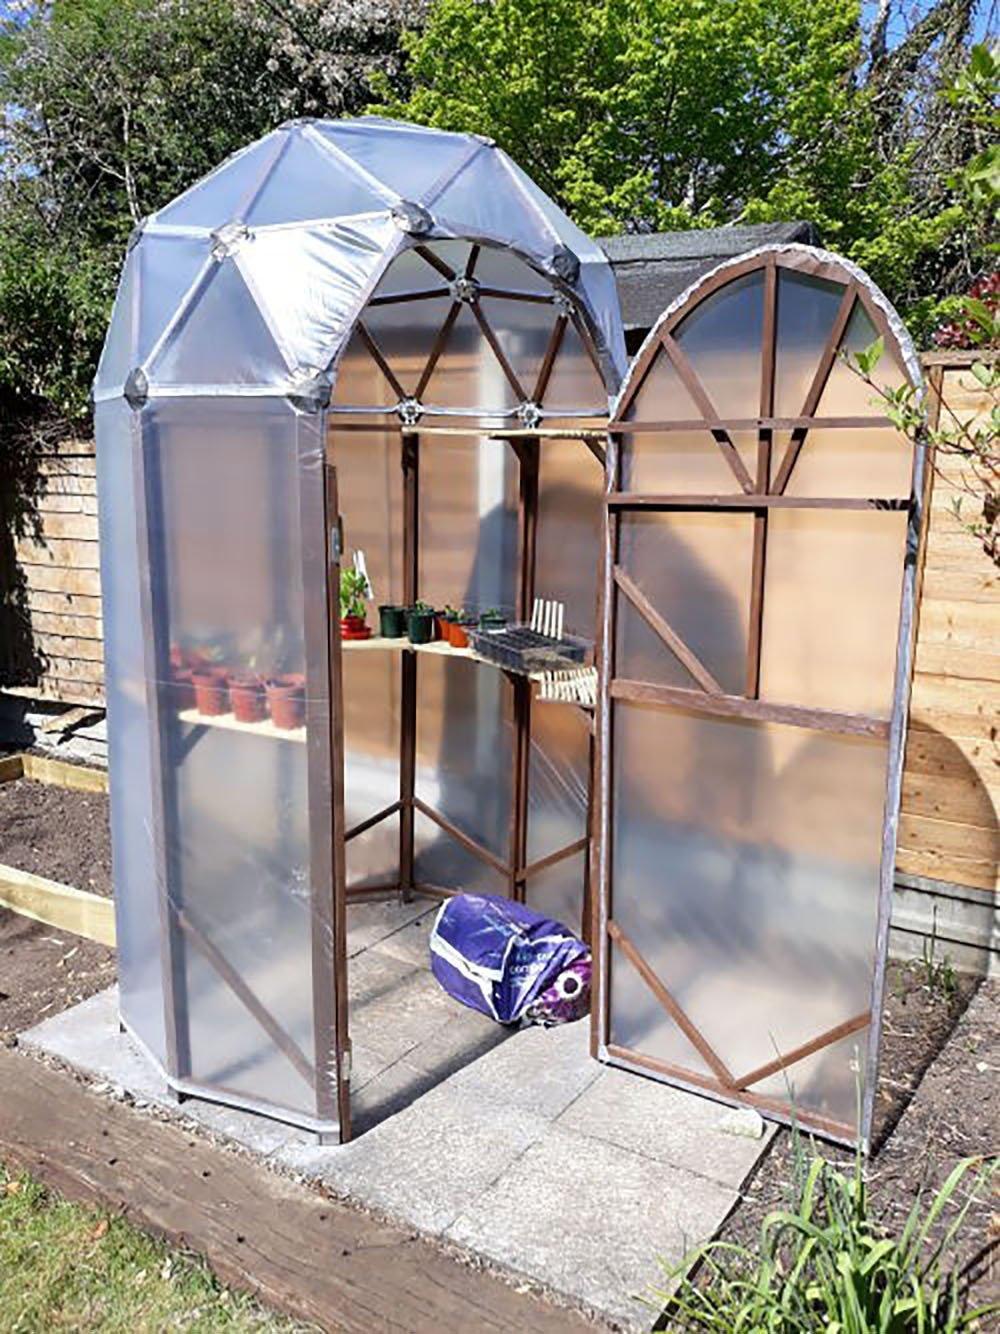 Home-made greenhouse